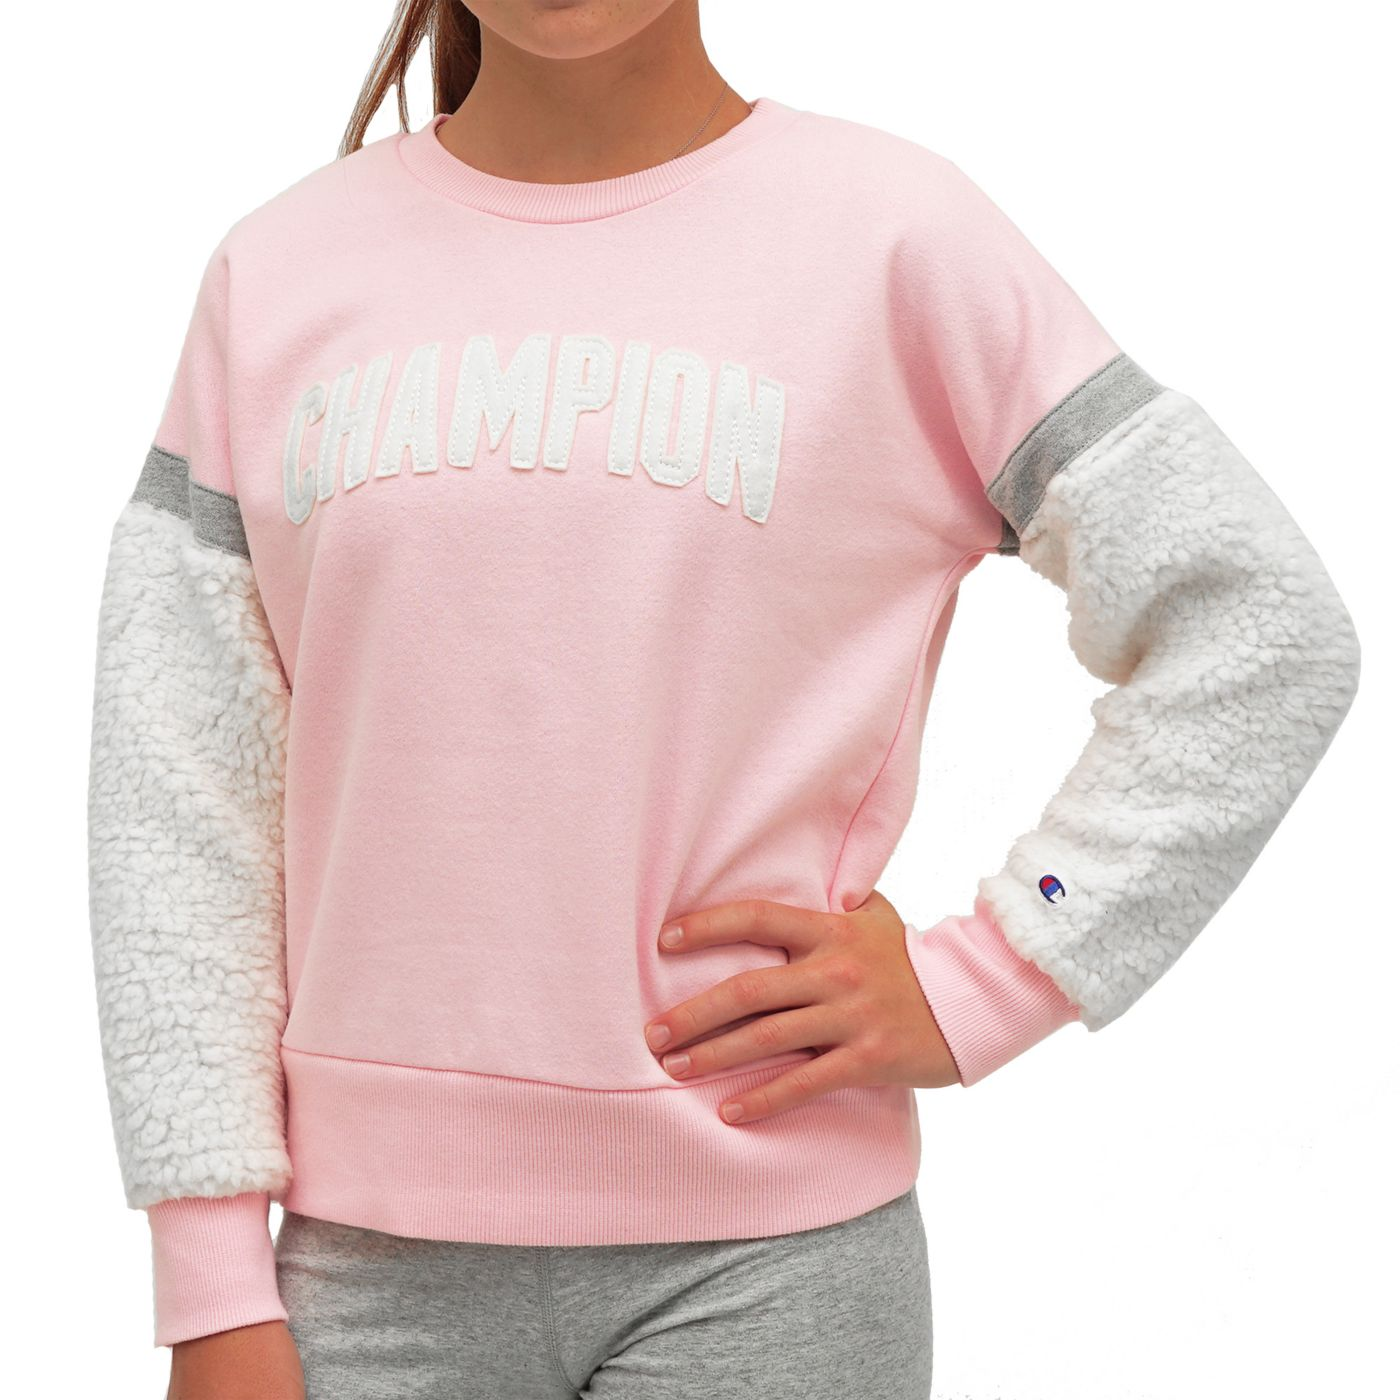 Champion Girl's Sherpa Sleeve Crewneck Sweatshirt